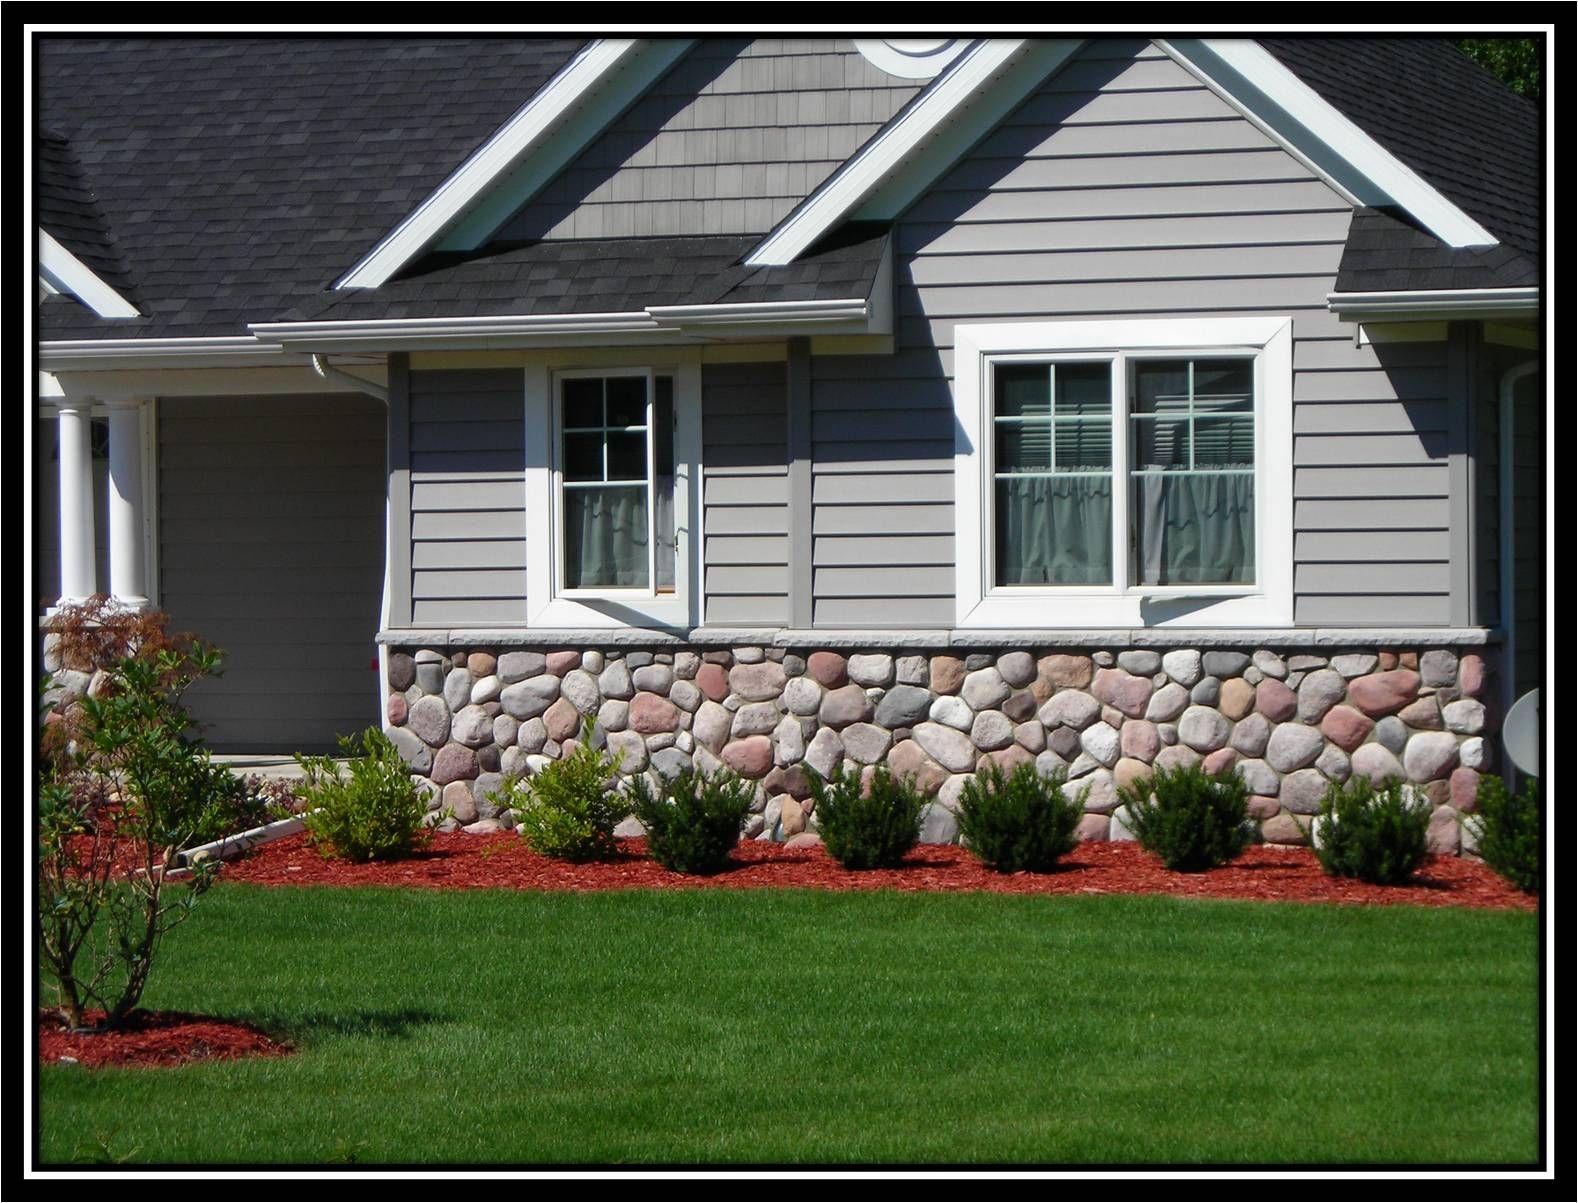 Stone Exterior Wainscot Indiana Fieldstone J N Stone Exterior Stone Fieldstone Landscape Products